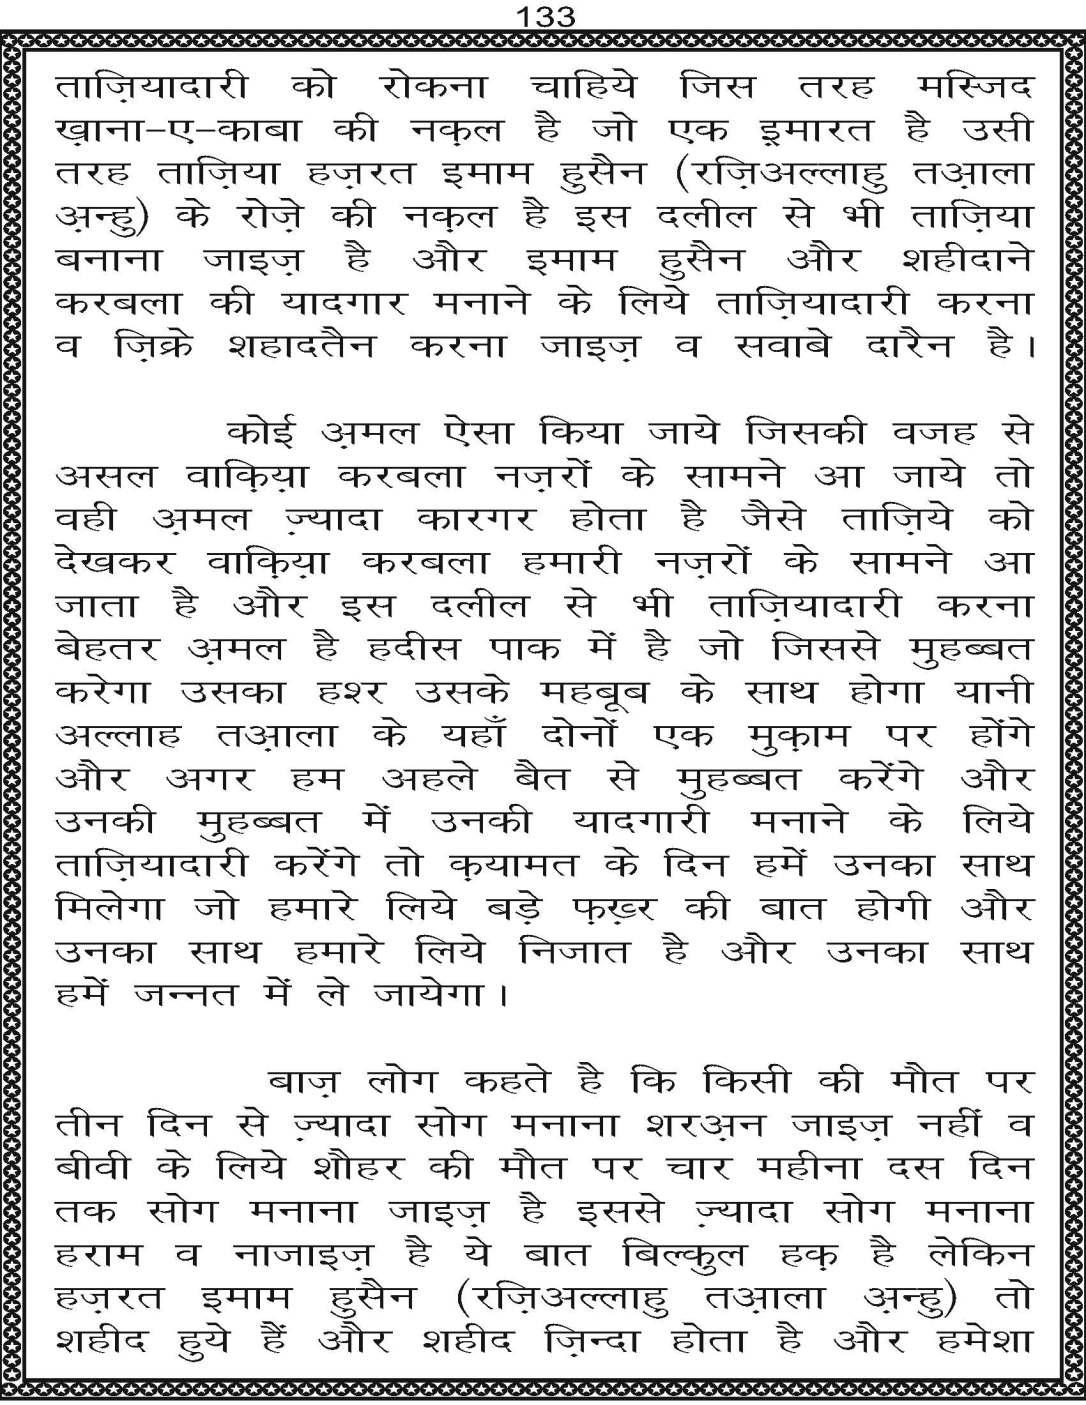 AzmateTaziyadari_Page_133